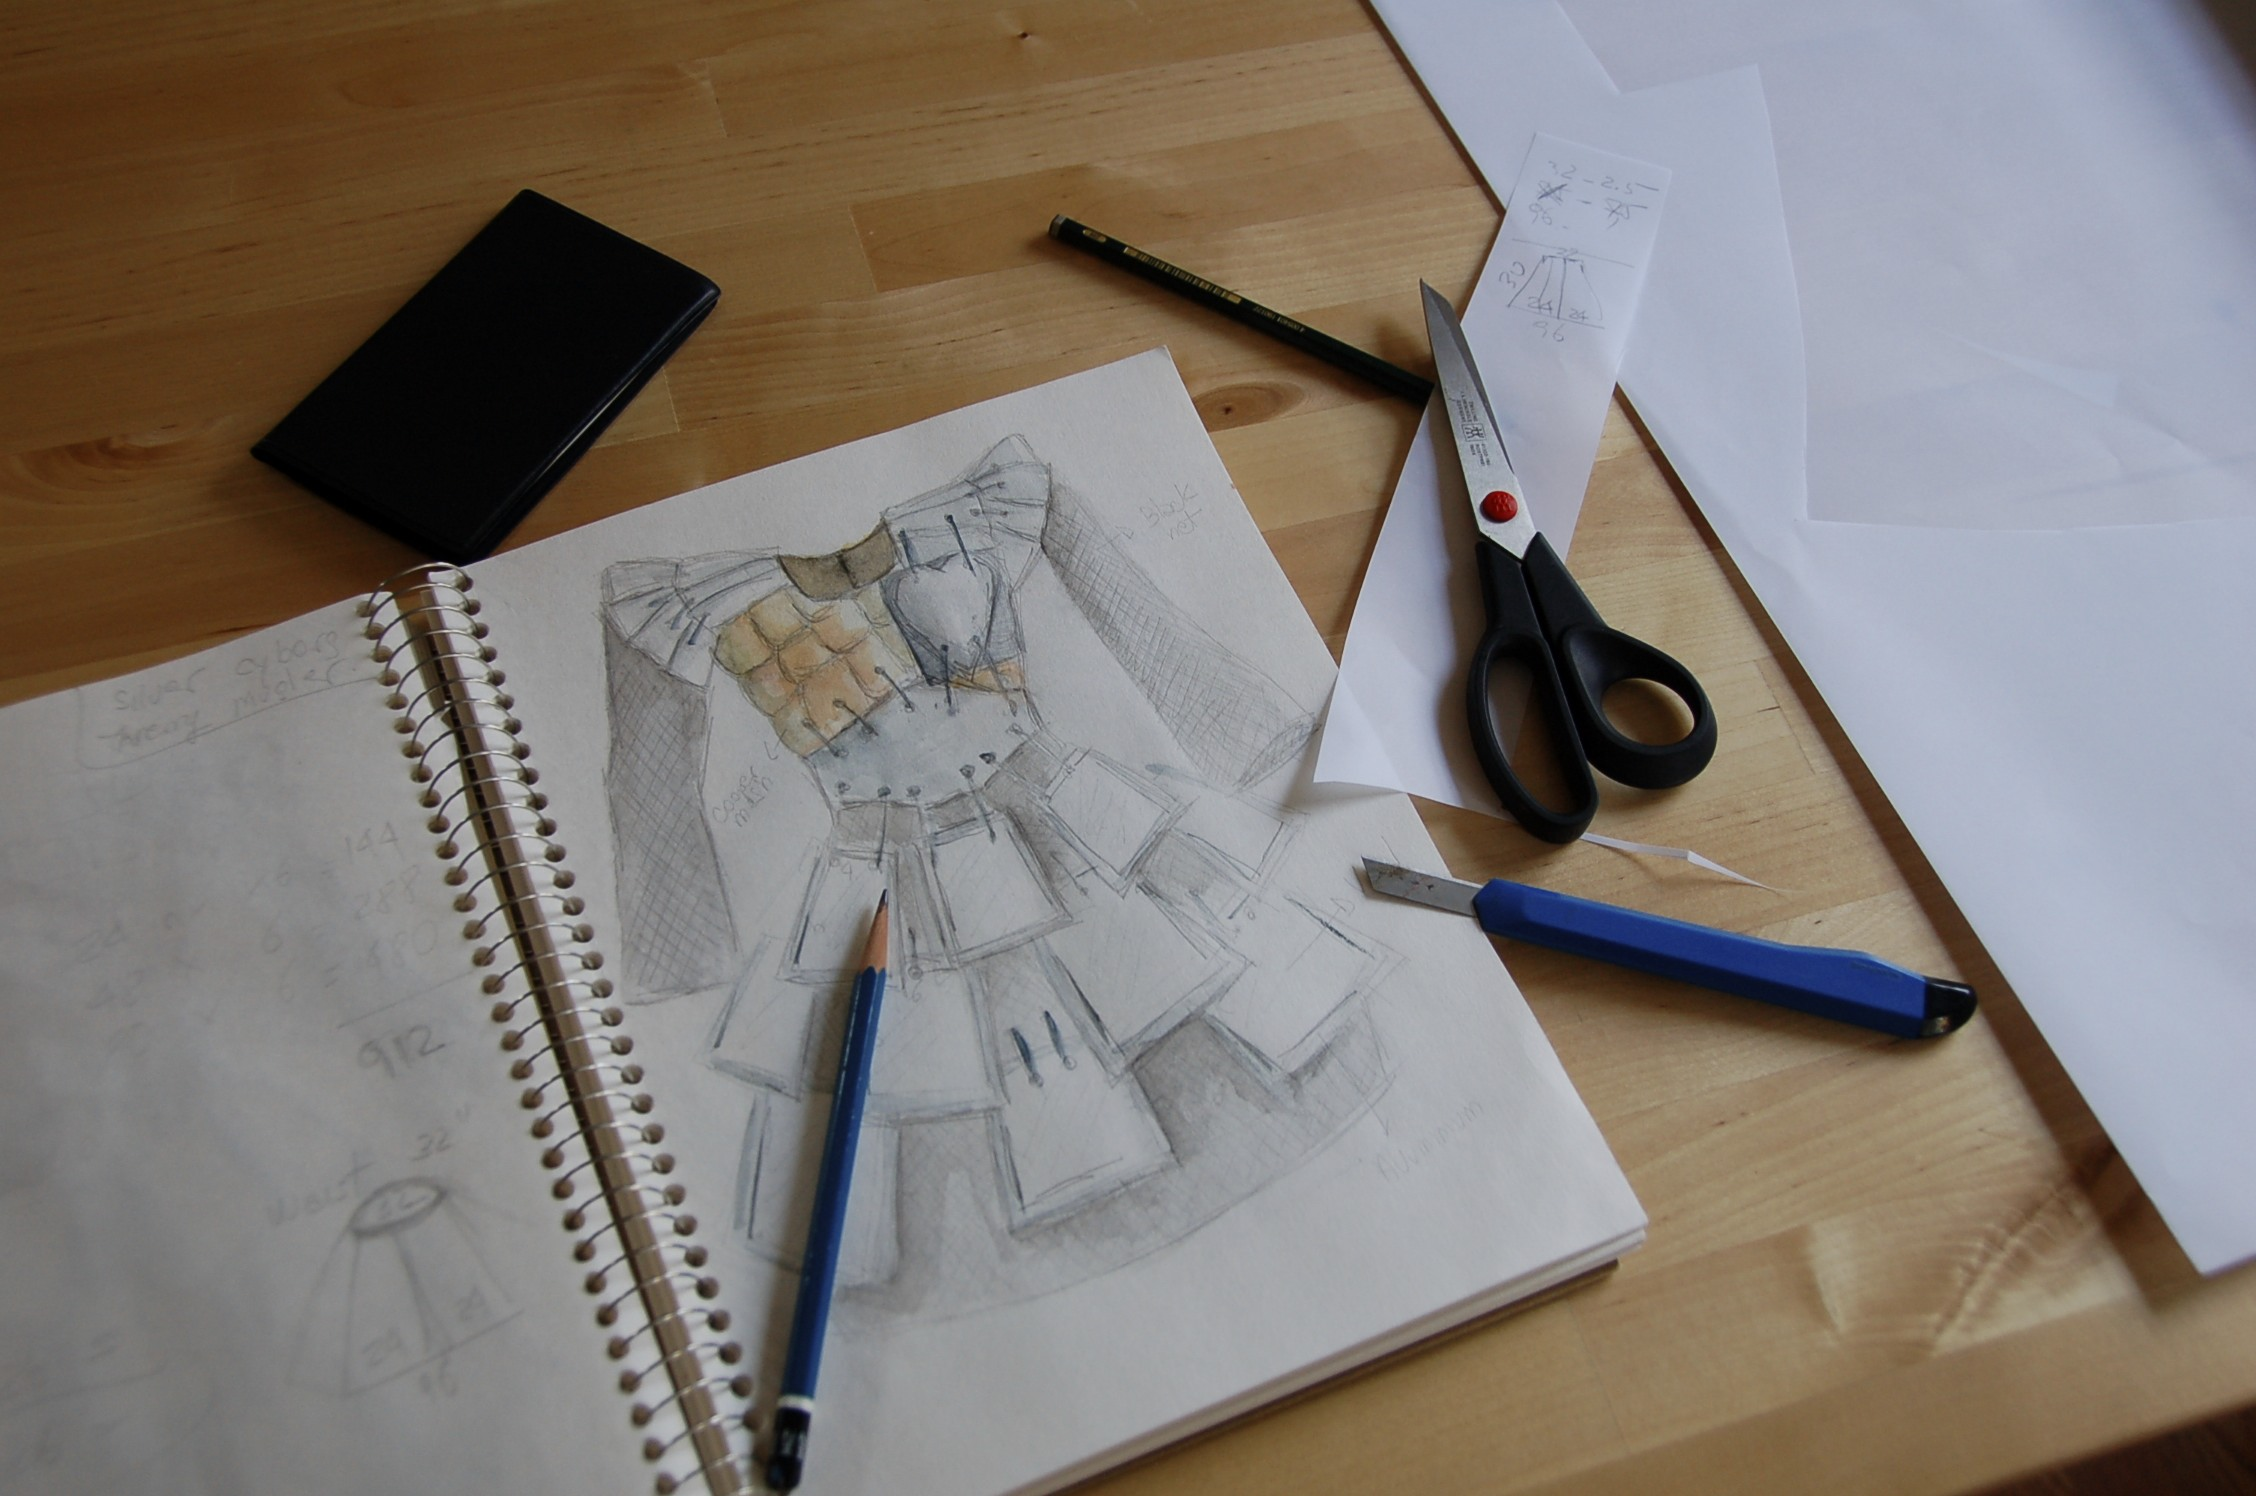 Warrior /sketch  2008